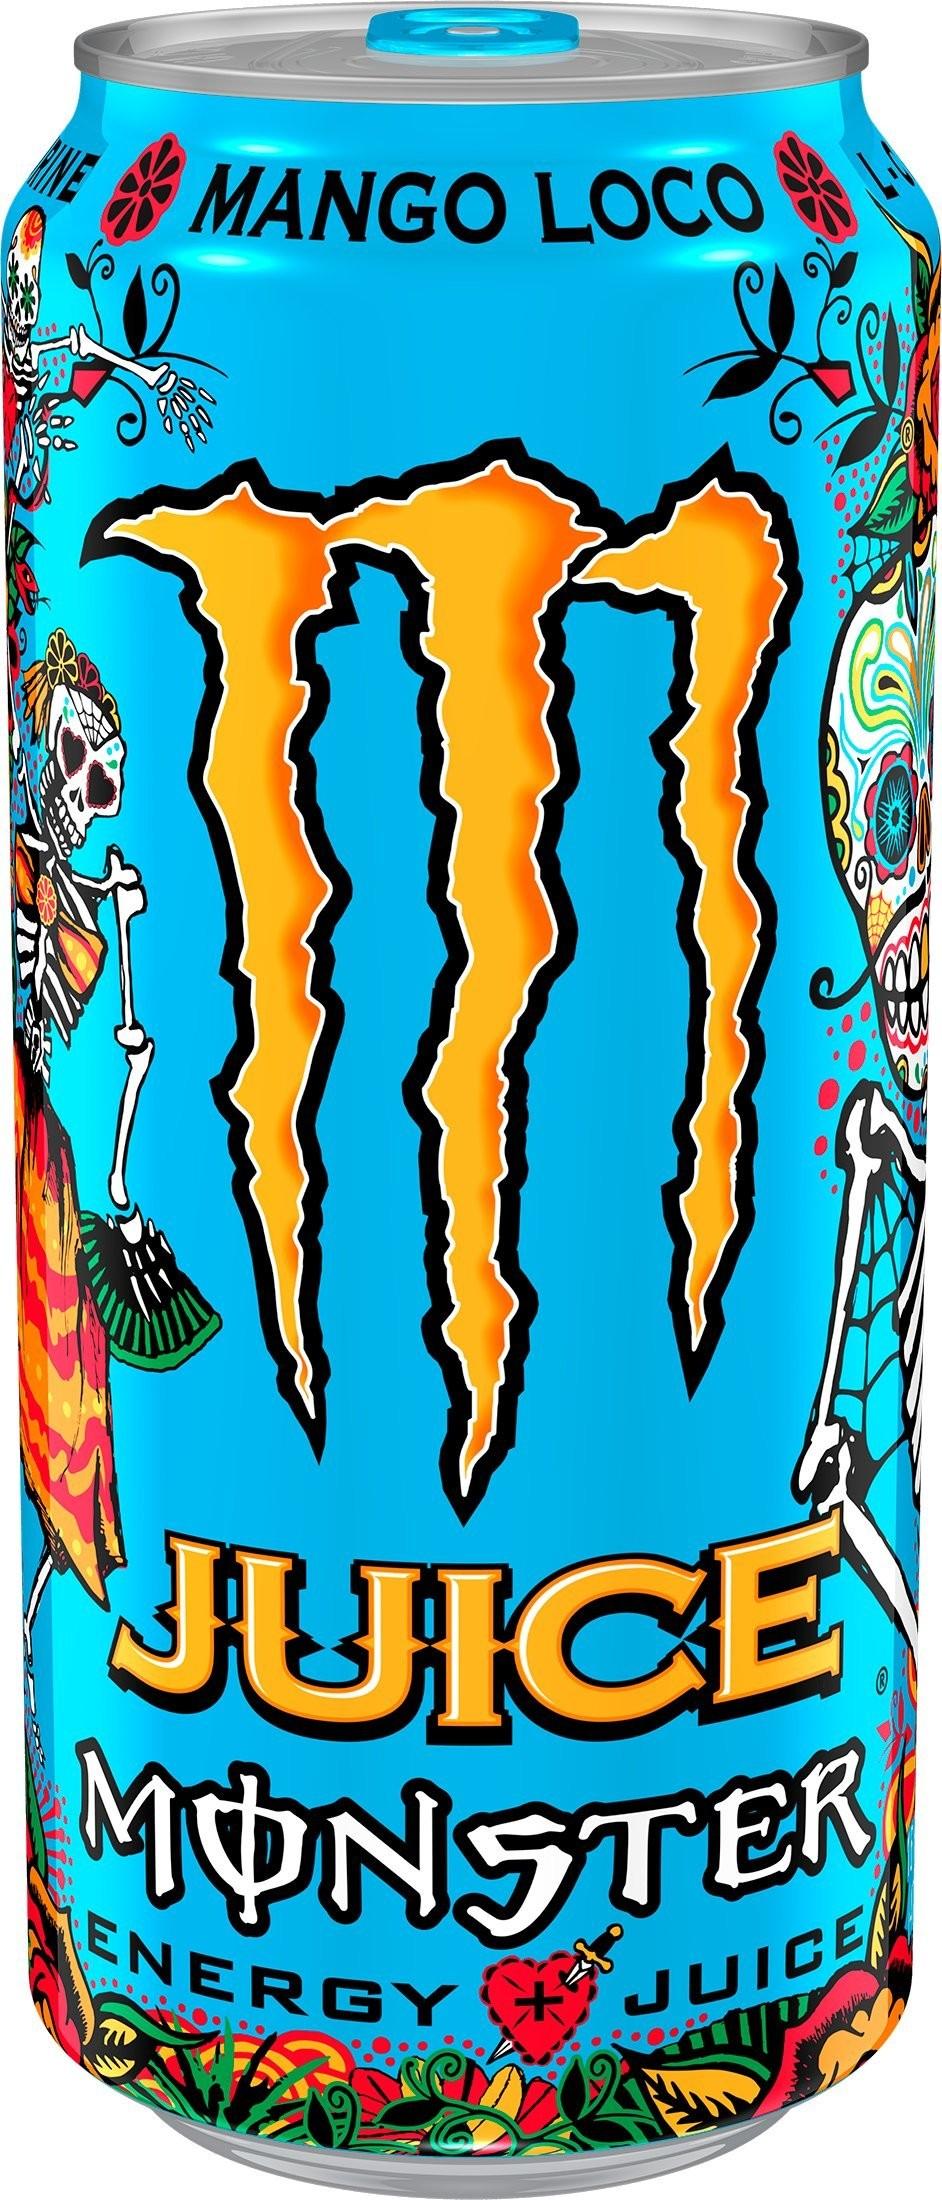 Monster Energy Juiced Mango Loco   Snackoree.com